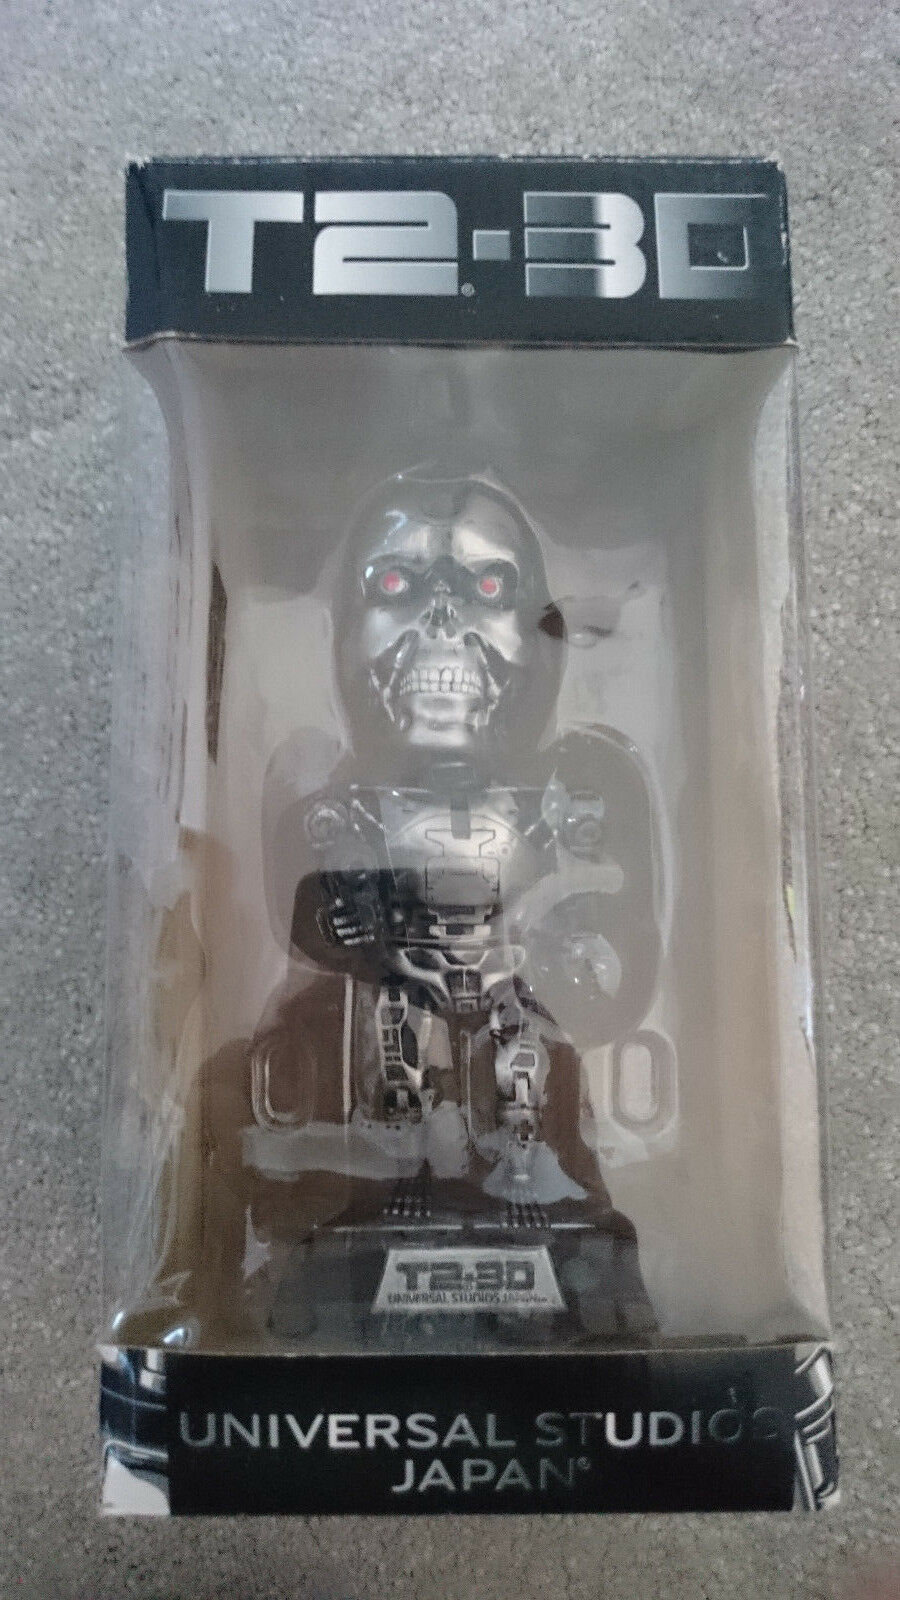 Terminator 2 wackelkopf bild - t2-3d universal studios japan